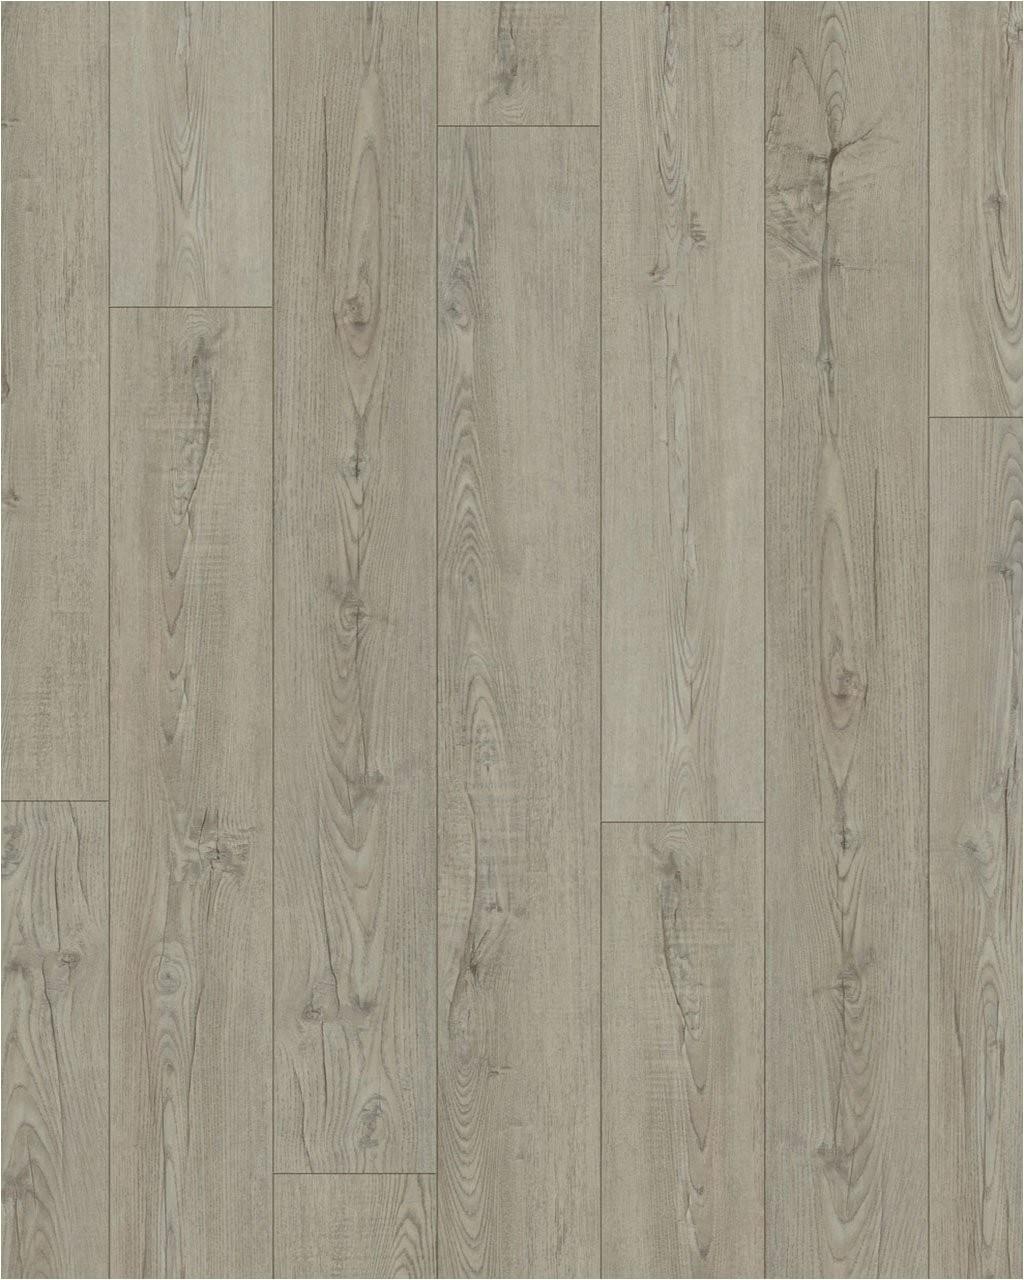 coretec plus hd timberland rustic pine waterproof floor